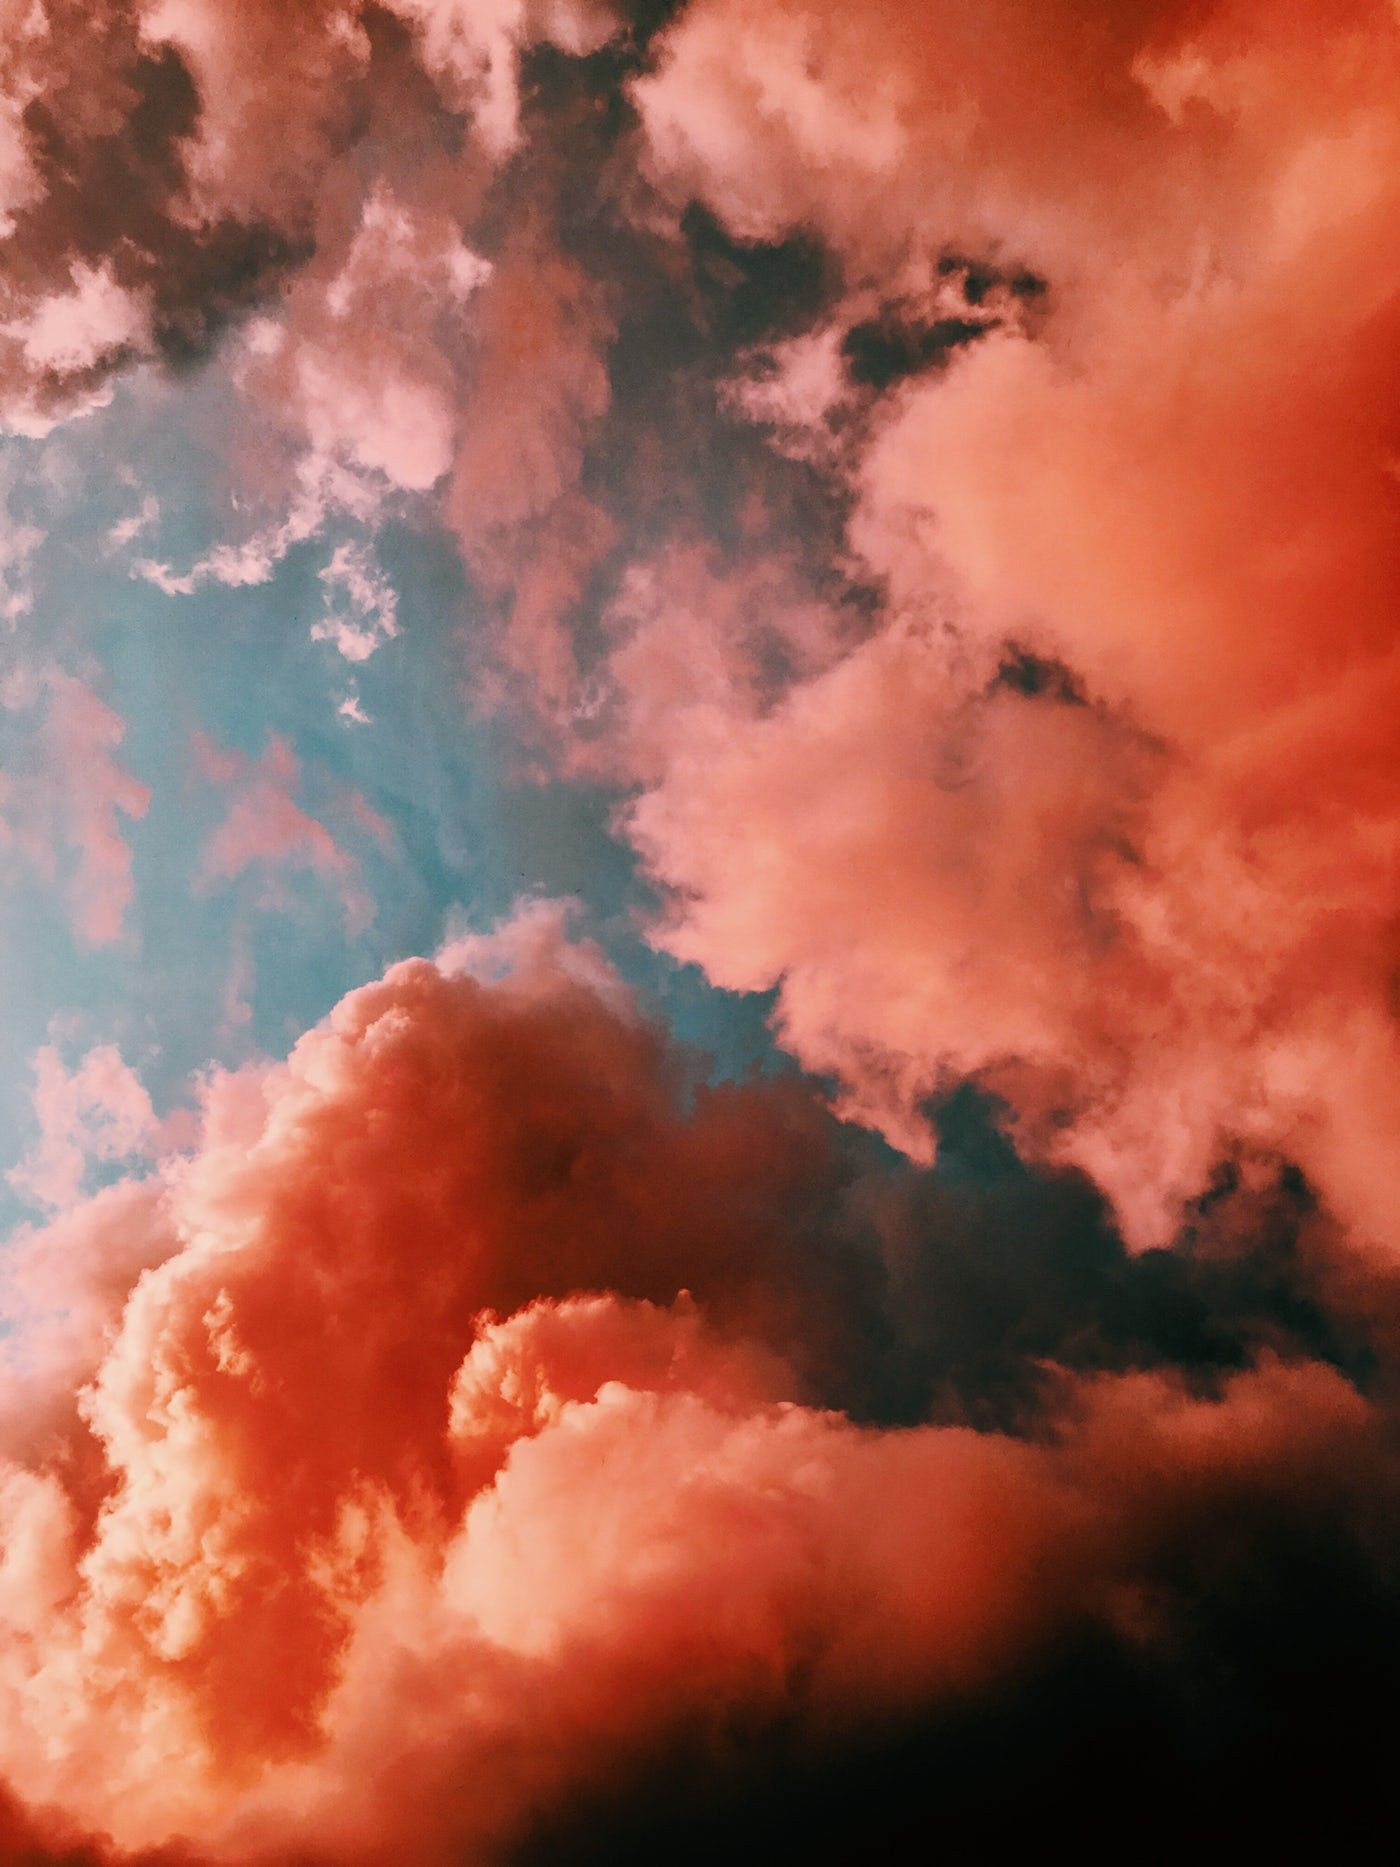 Colors Smoke Clouds wallpaper iphone, Sky aesthetic